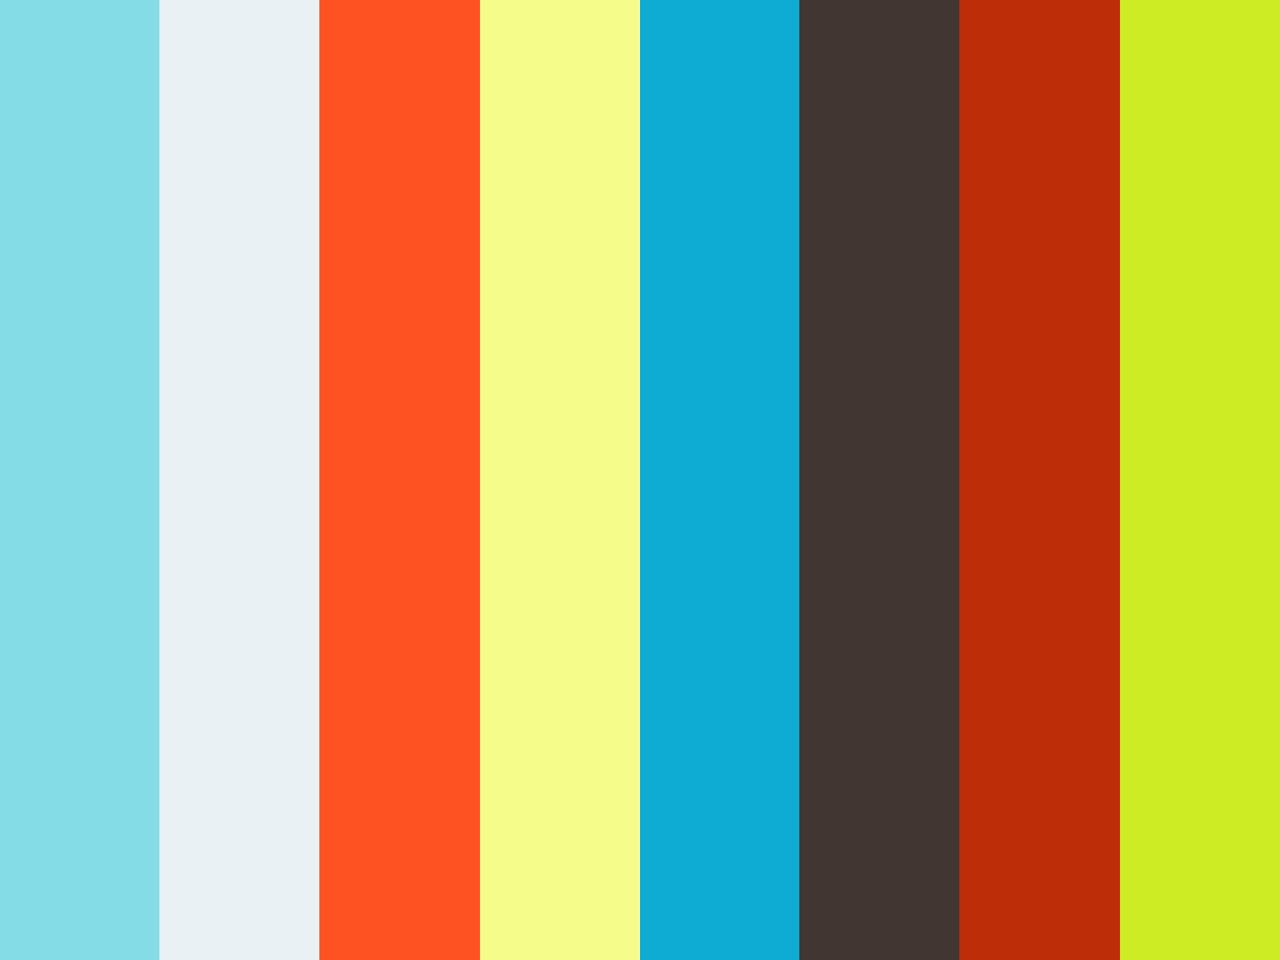 "Panasonic LUMIX GH5 10-bit Film ""BEYOND THE GRID"" by Luke Neumann"